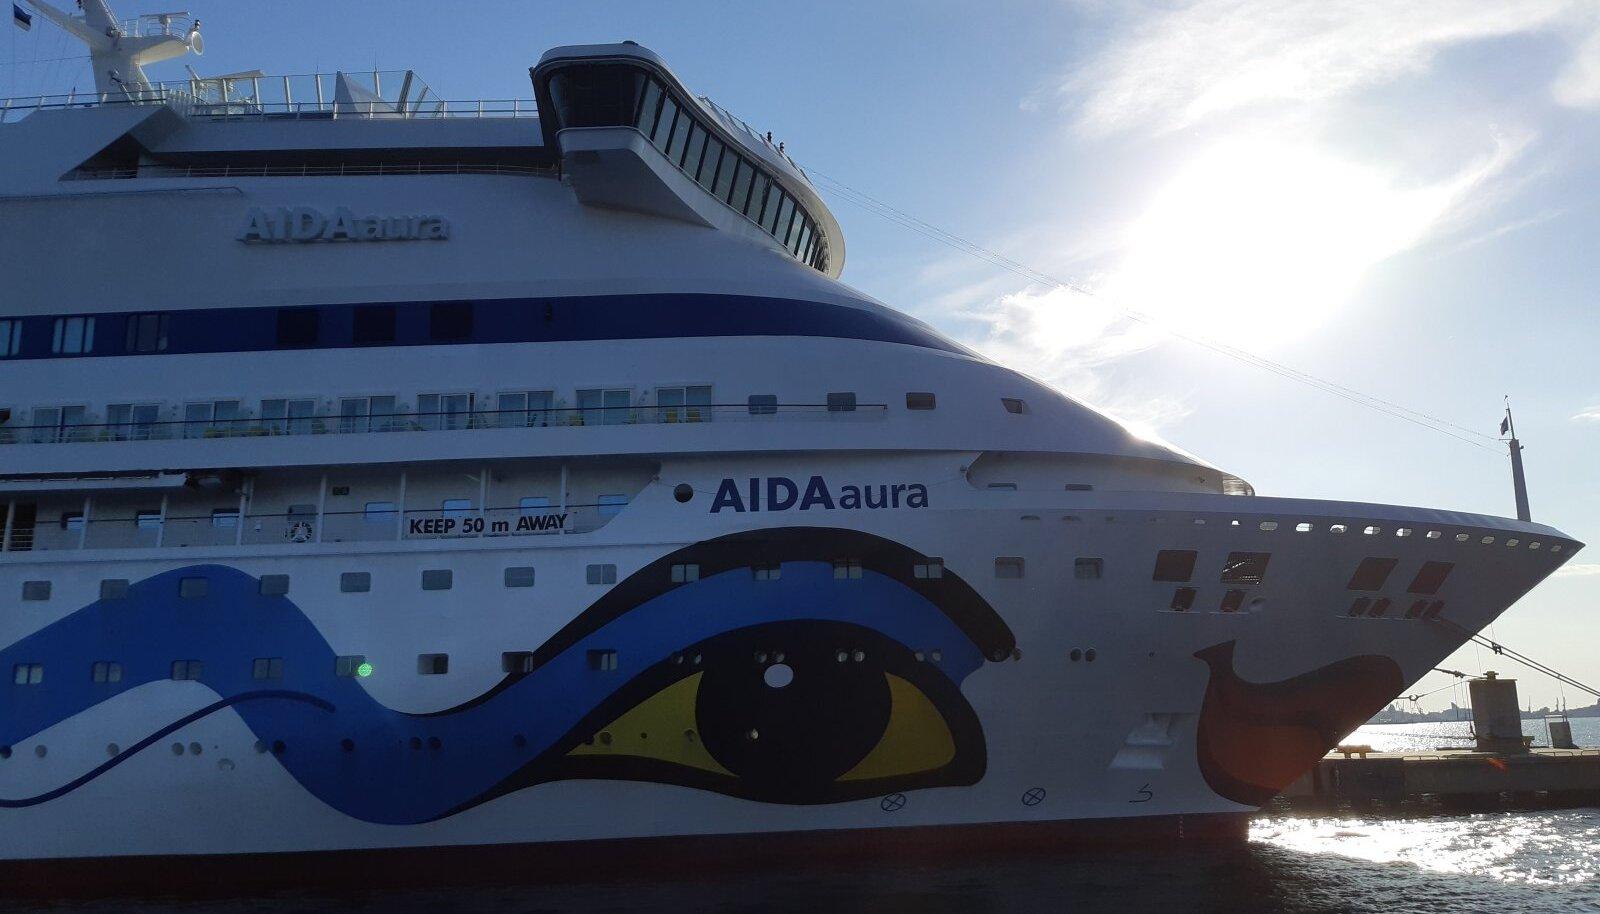 AidaAura laev vanasadamas A-terminalis kai ääres